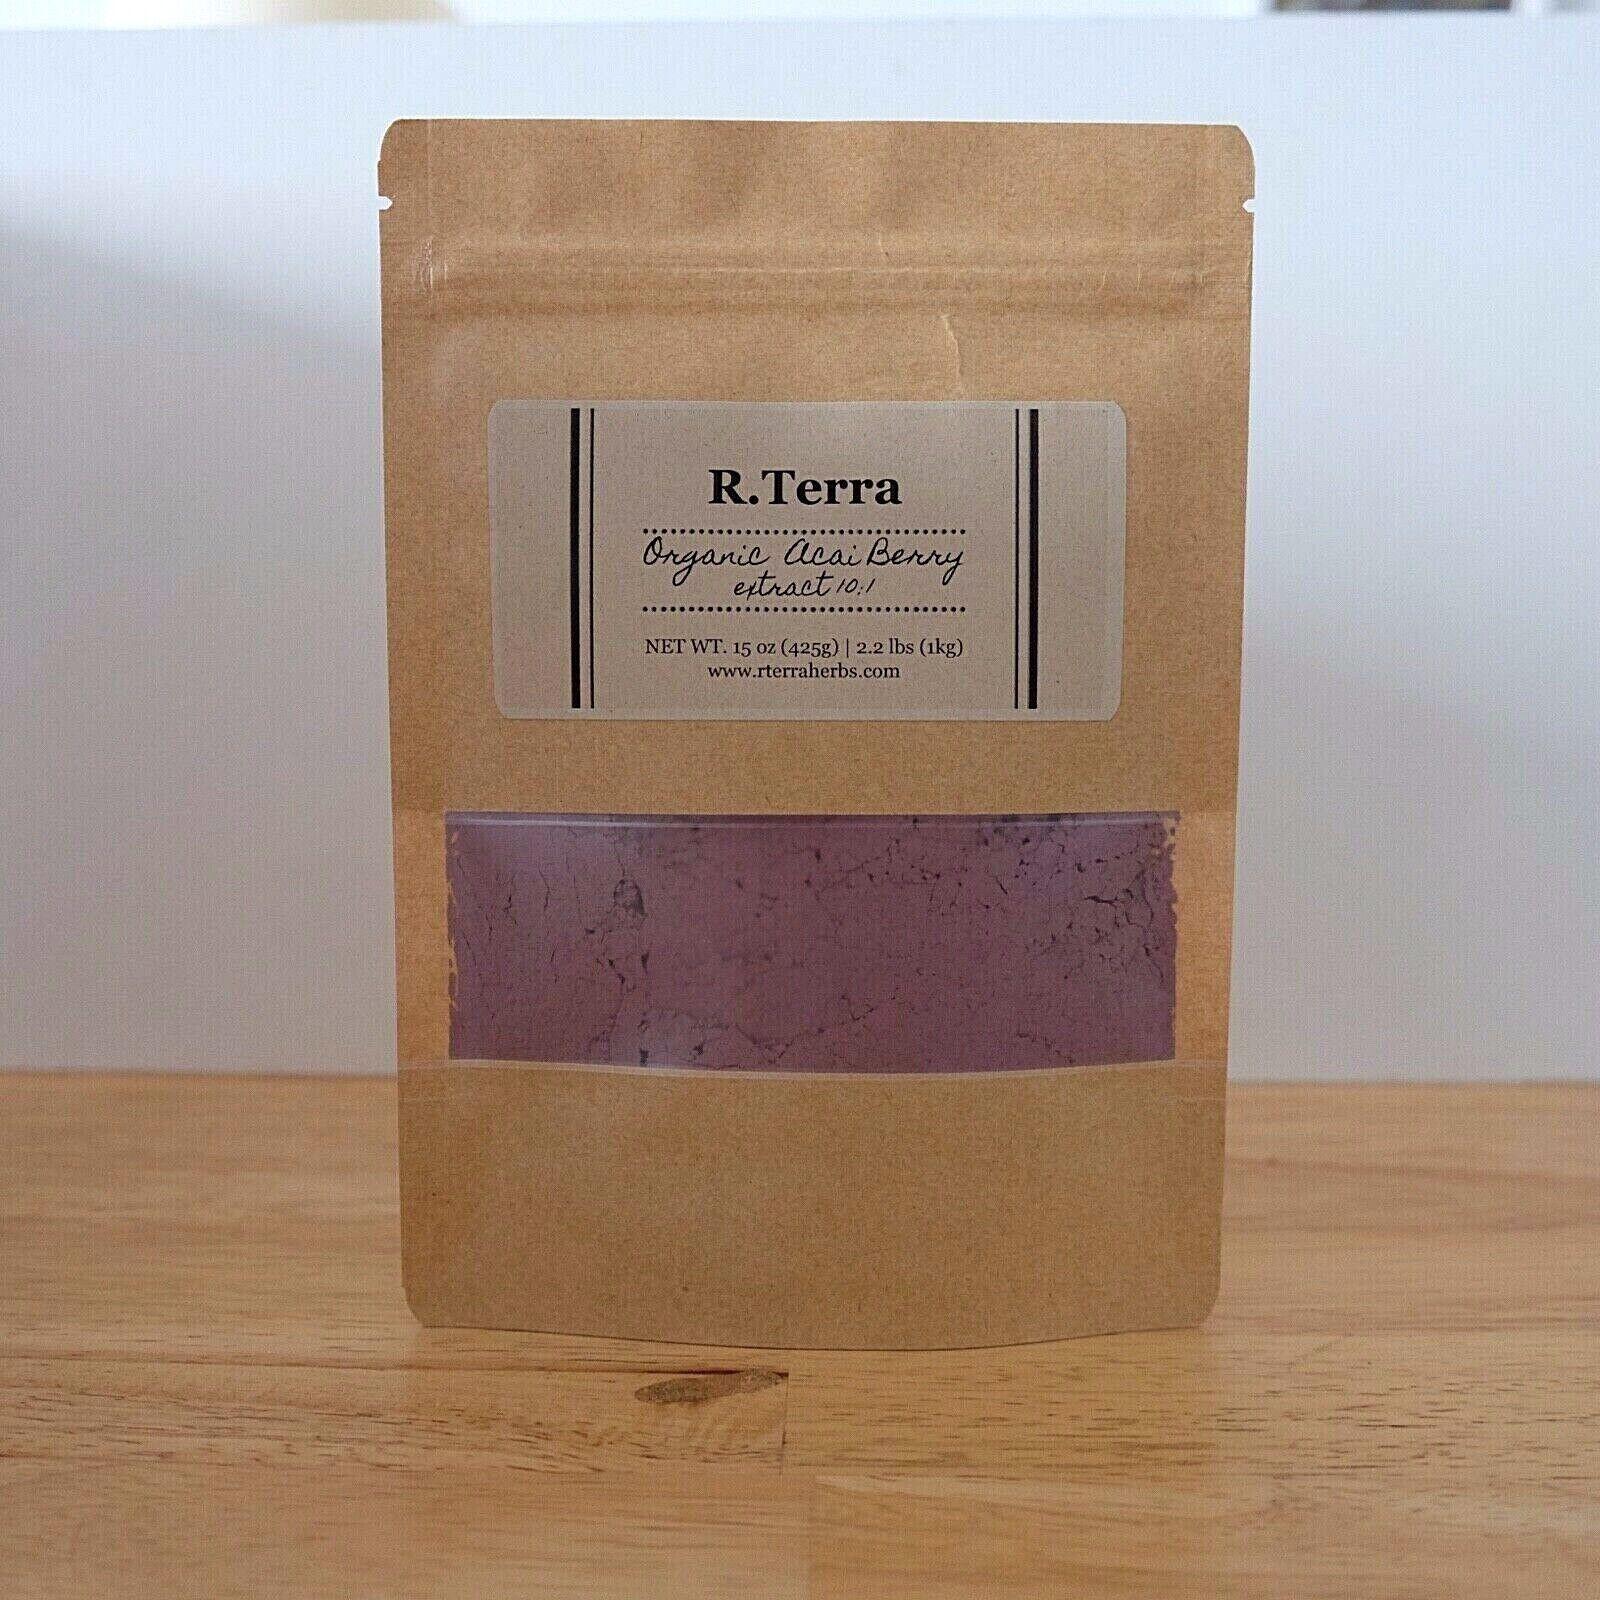 Acai Berry Boost Energy 10X Stronger Organic Extract Powder Natural Vegan